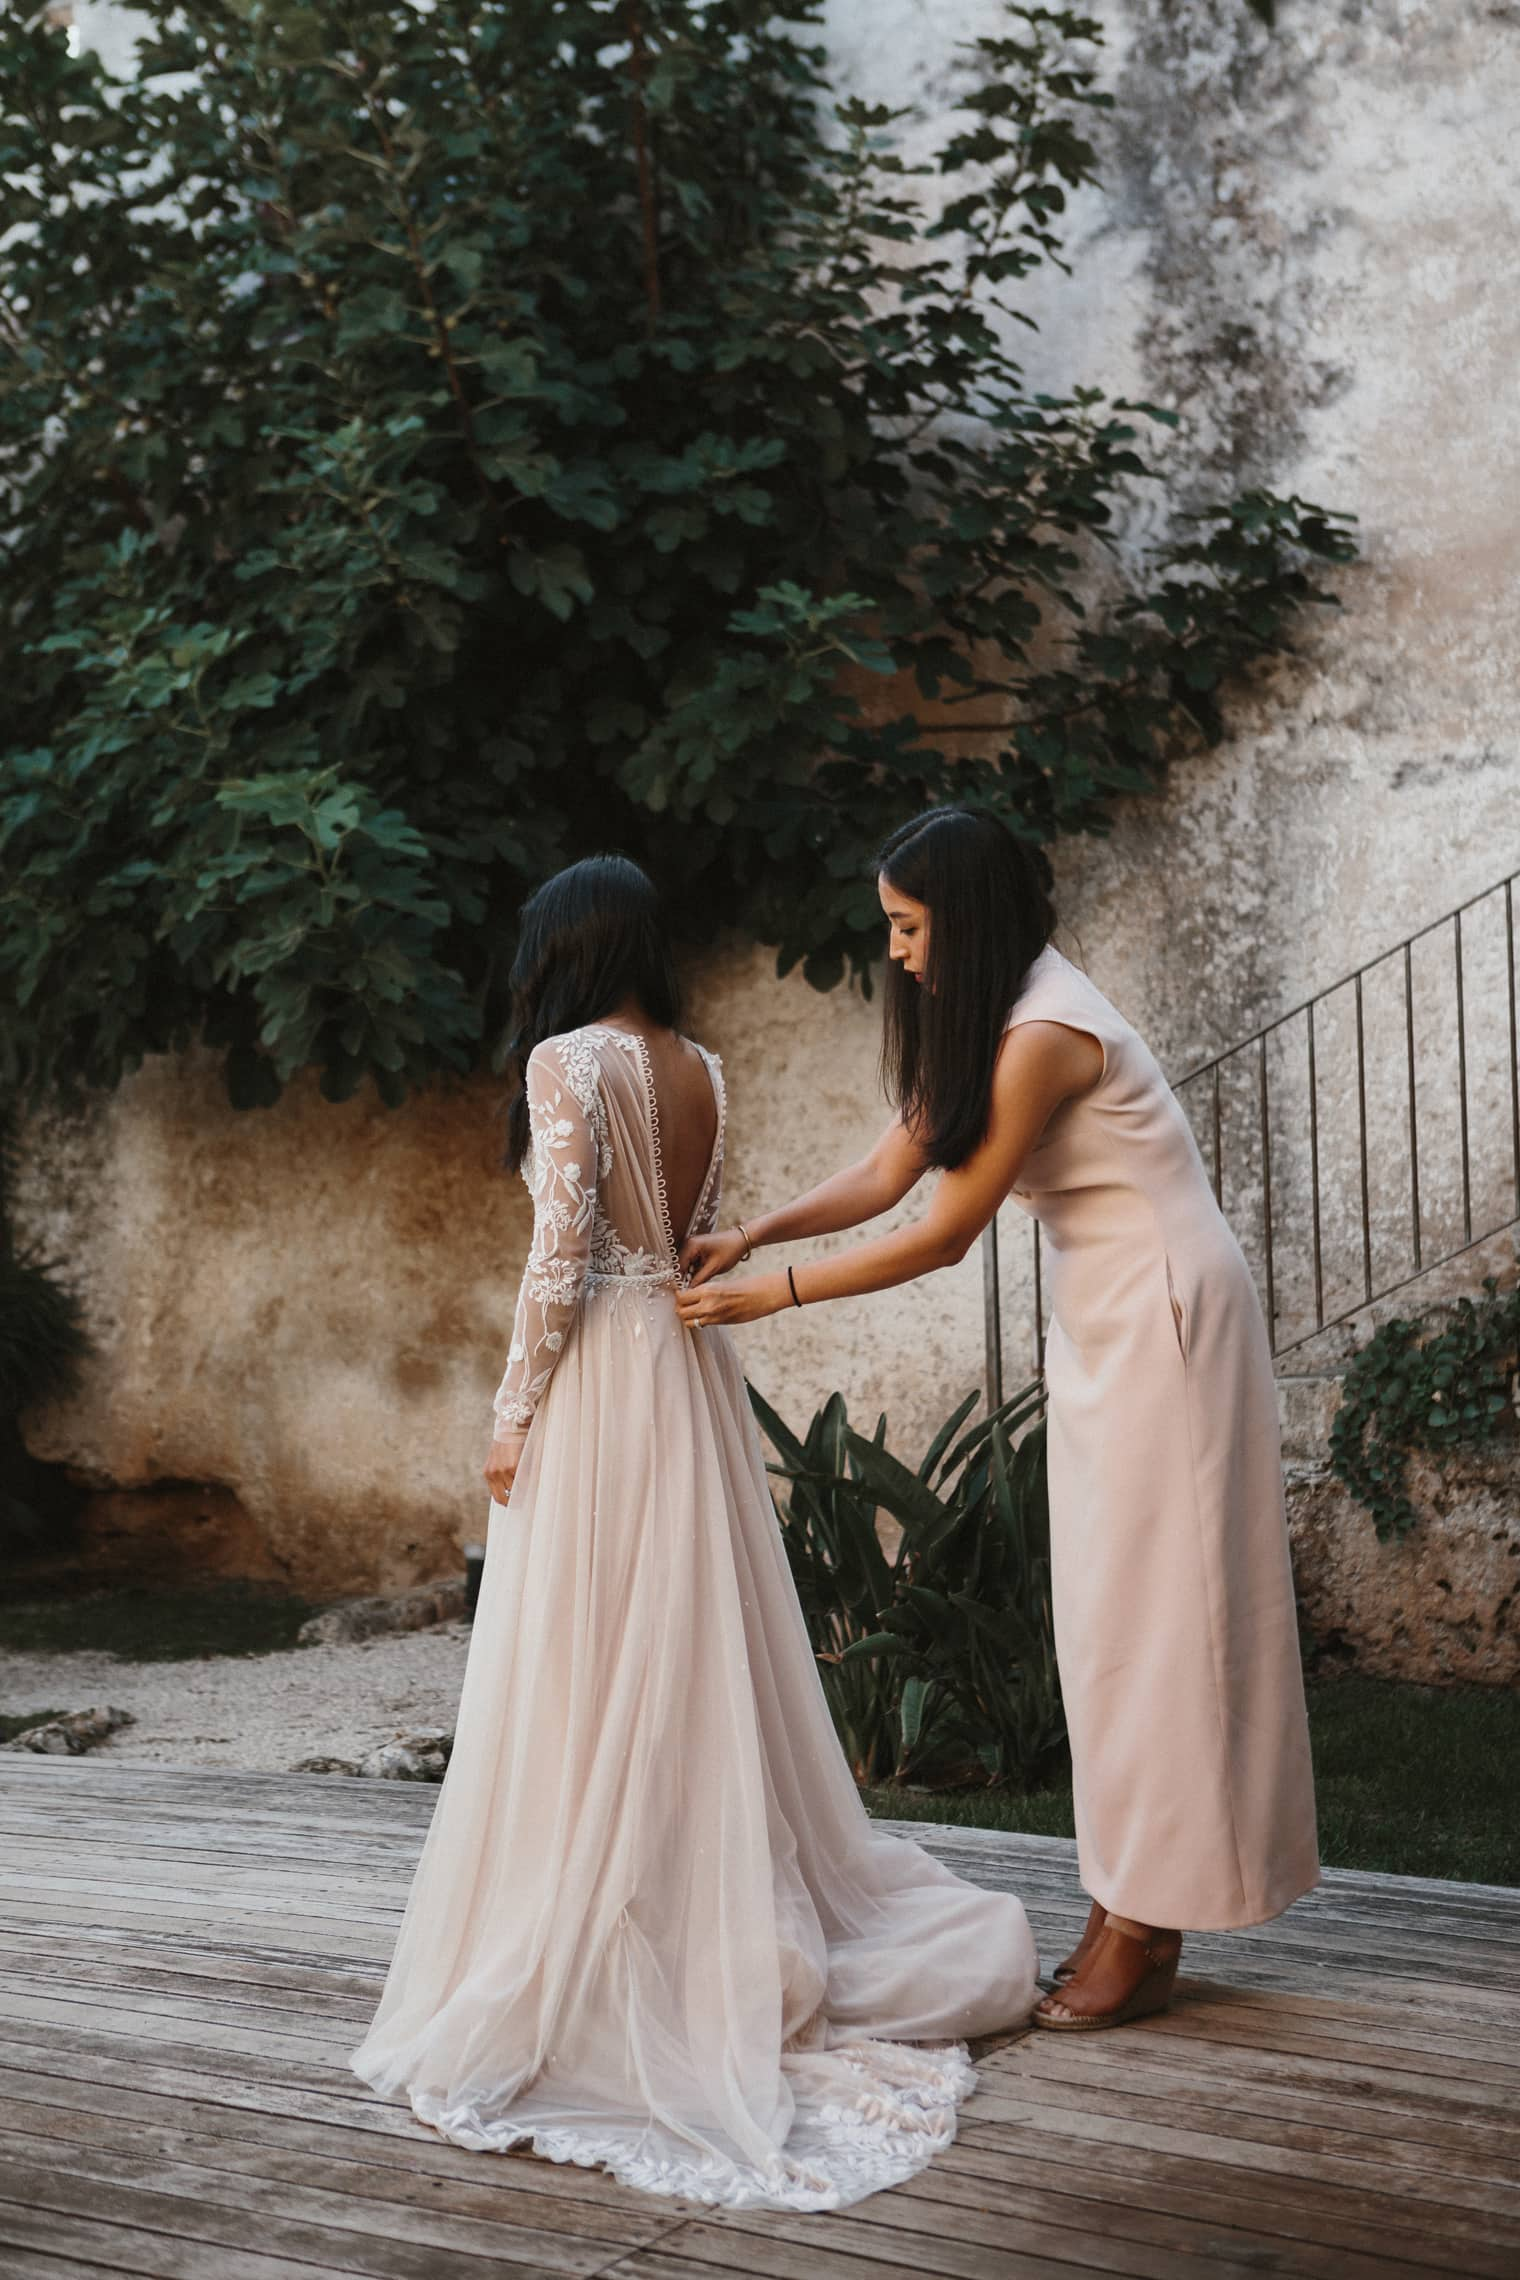 Bride wearing Hermione de Paula gown for her destination wedding in italy